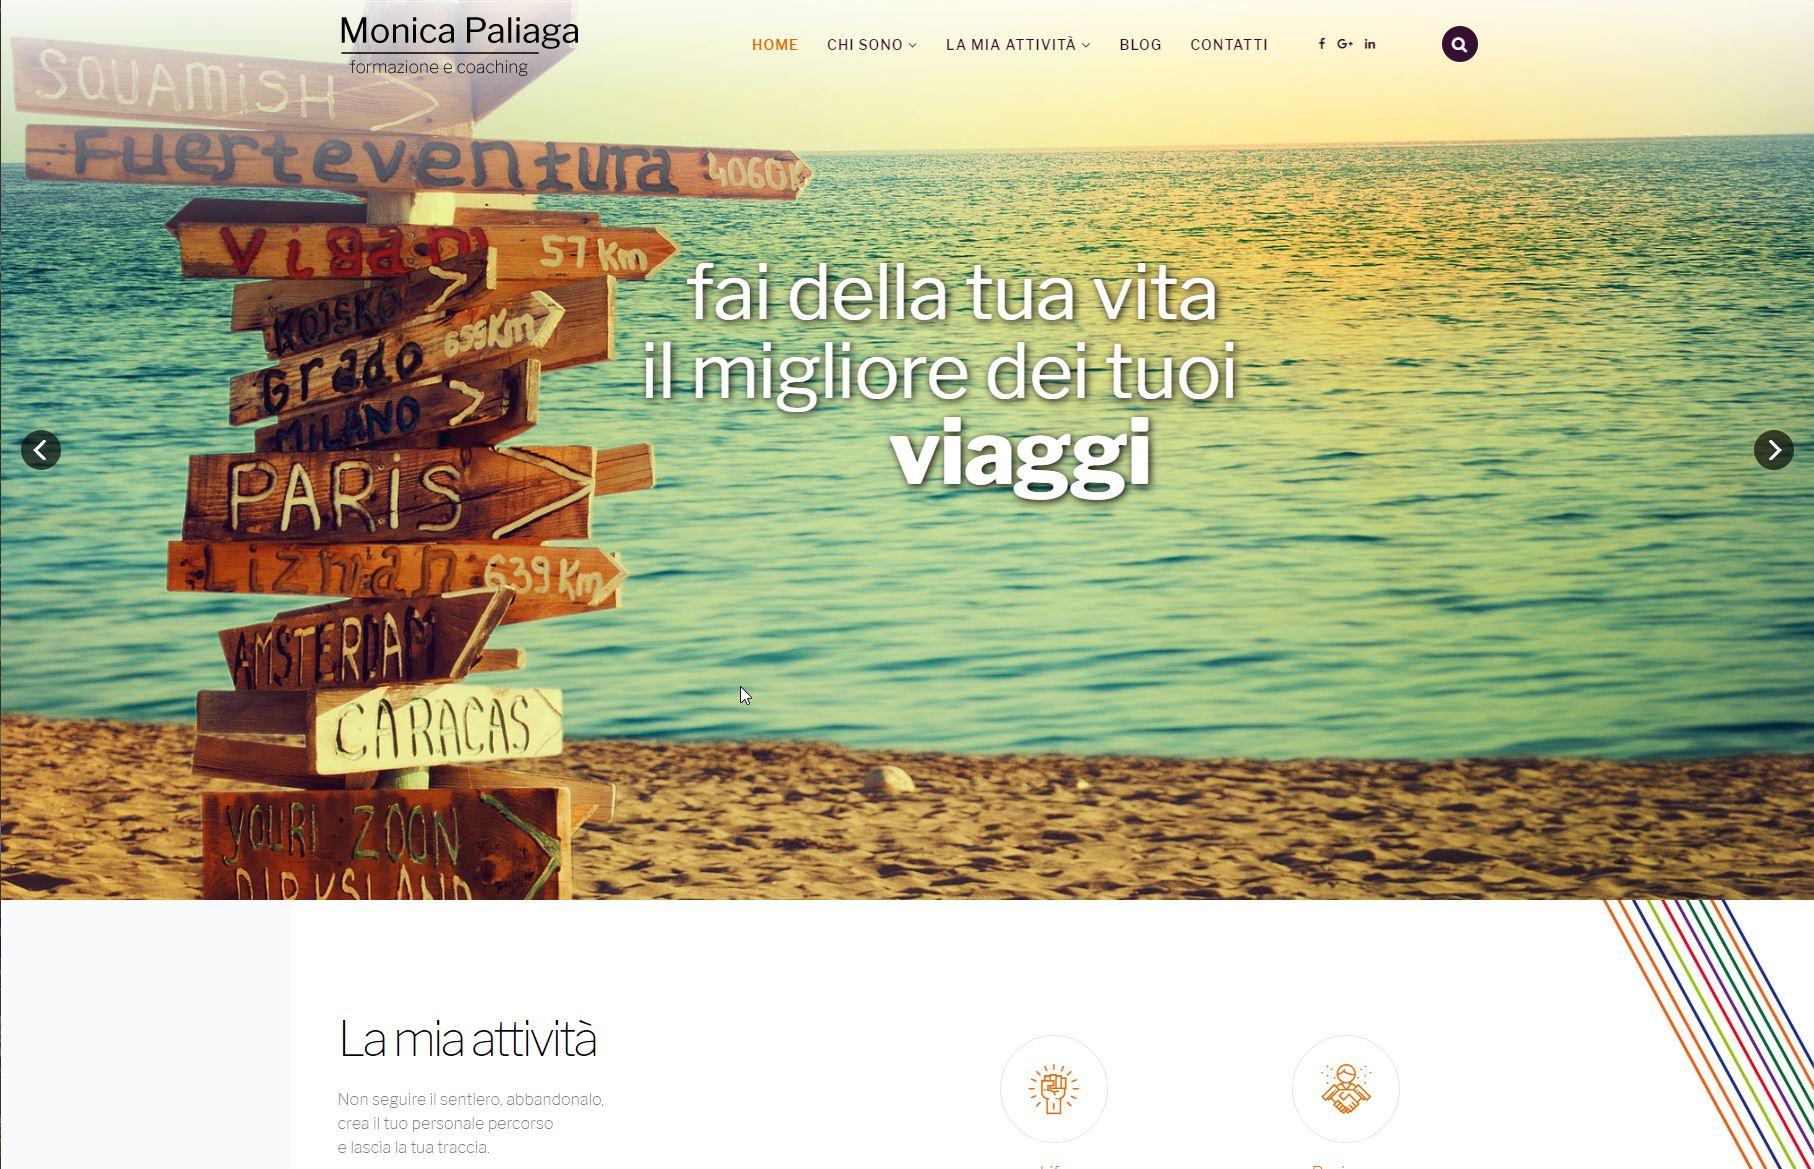 www.monicapaliaga.it